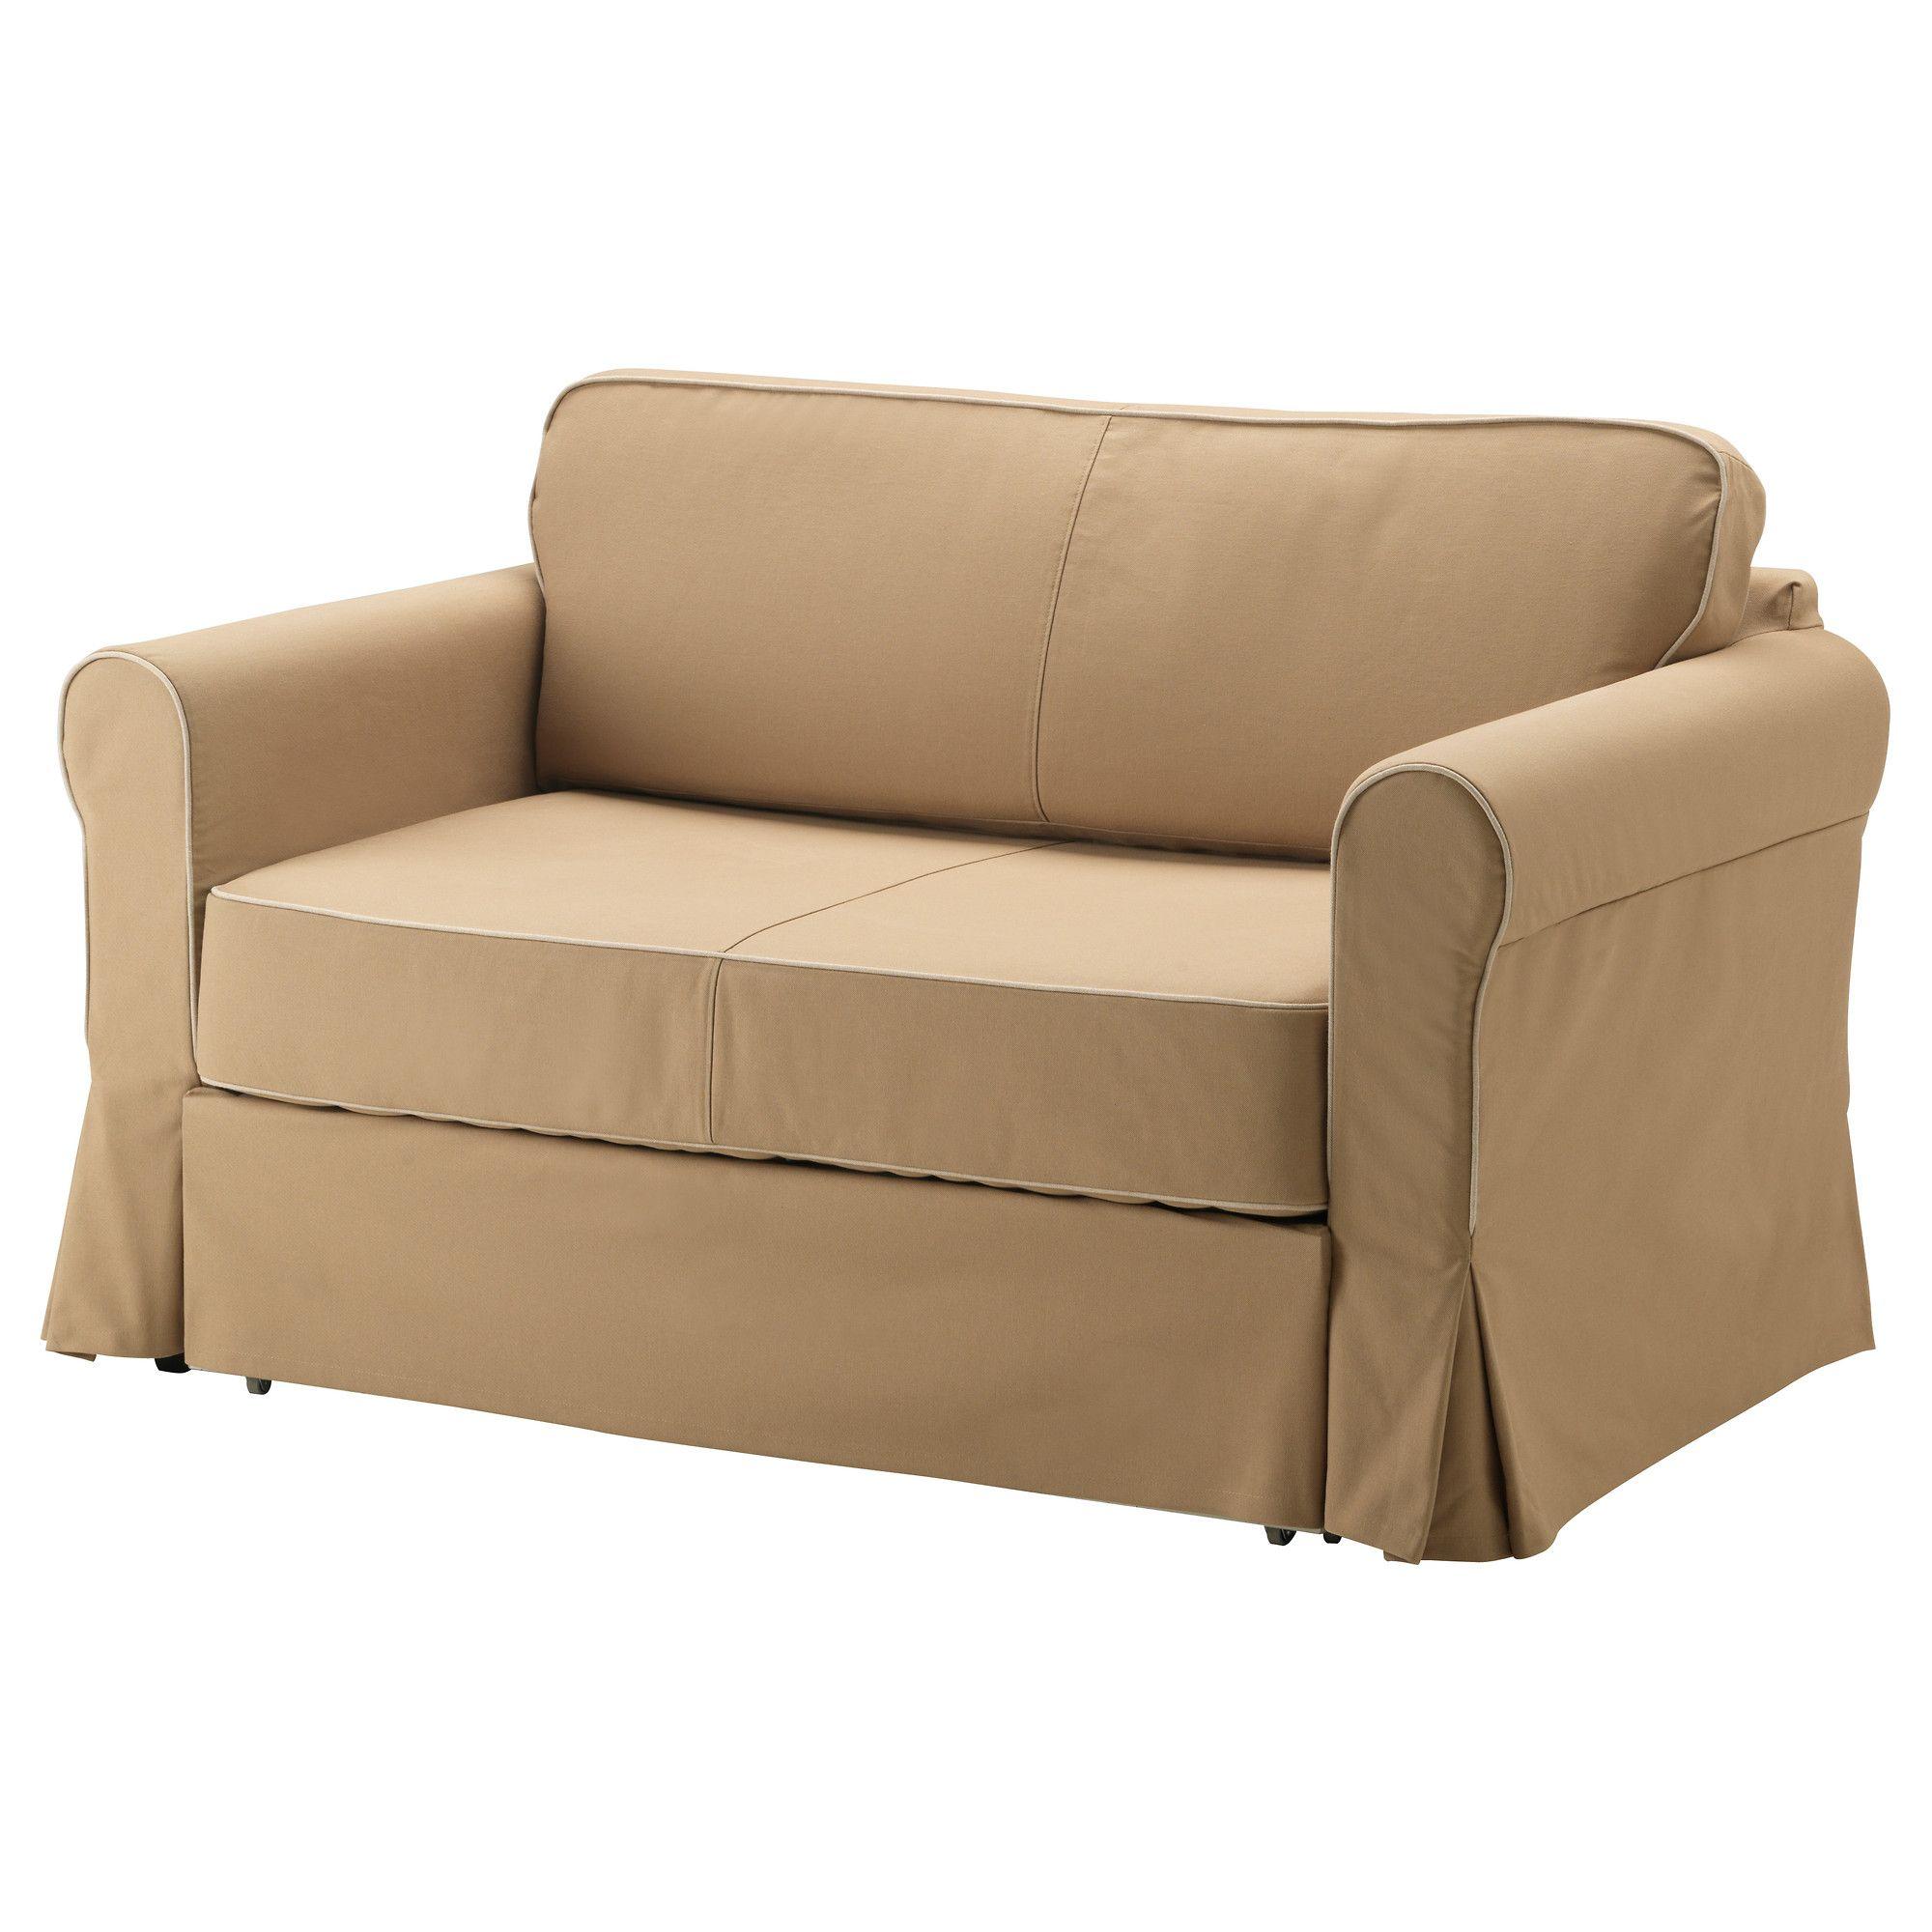 Us Furniture And Home Furnishings Small Sofa Bed Ikea Sofa